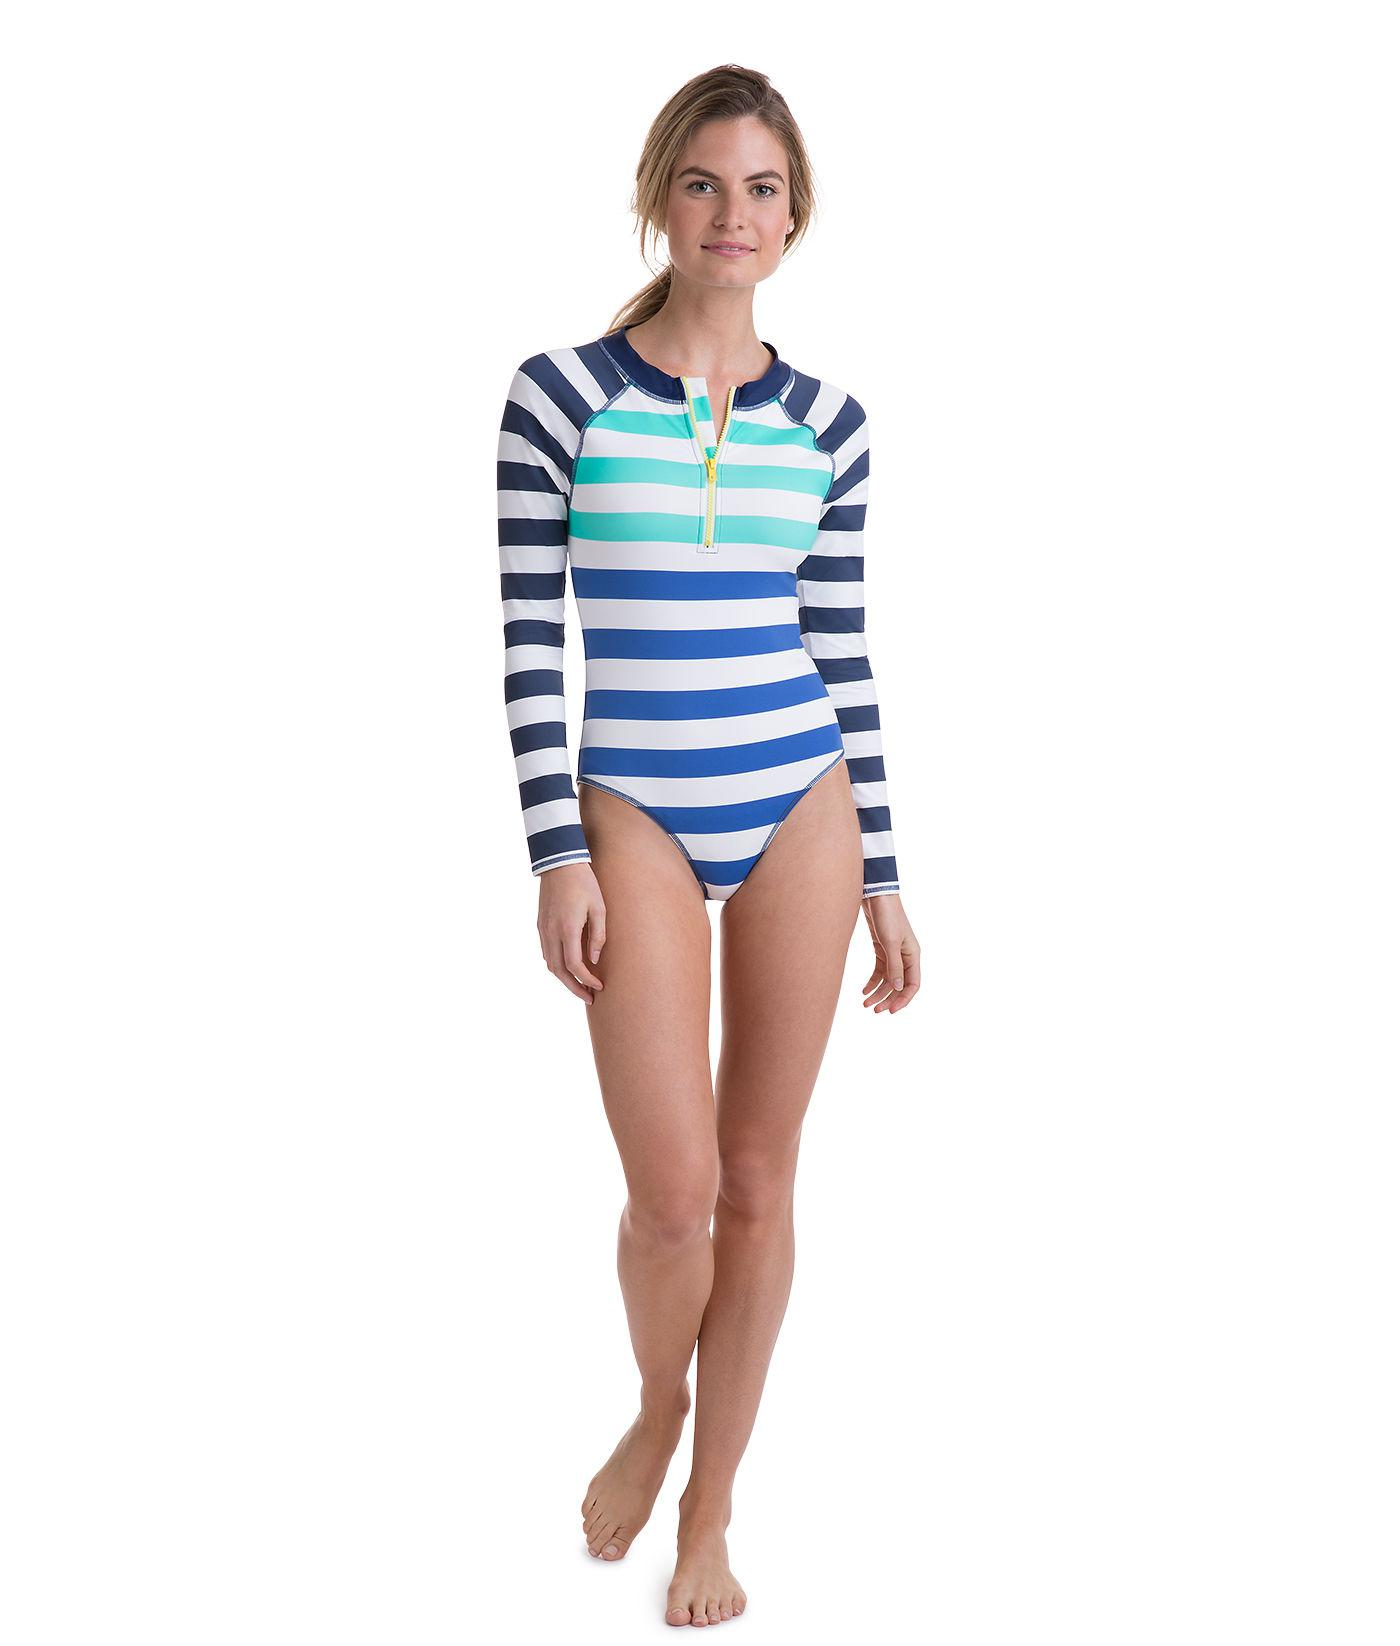 1e0657564d Lyst - Vineyard Vines Flag Stripe One Piece Rash Guard in Blue